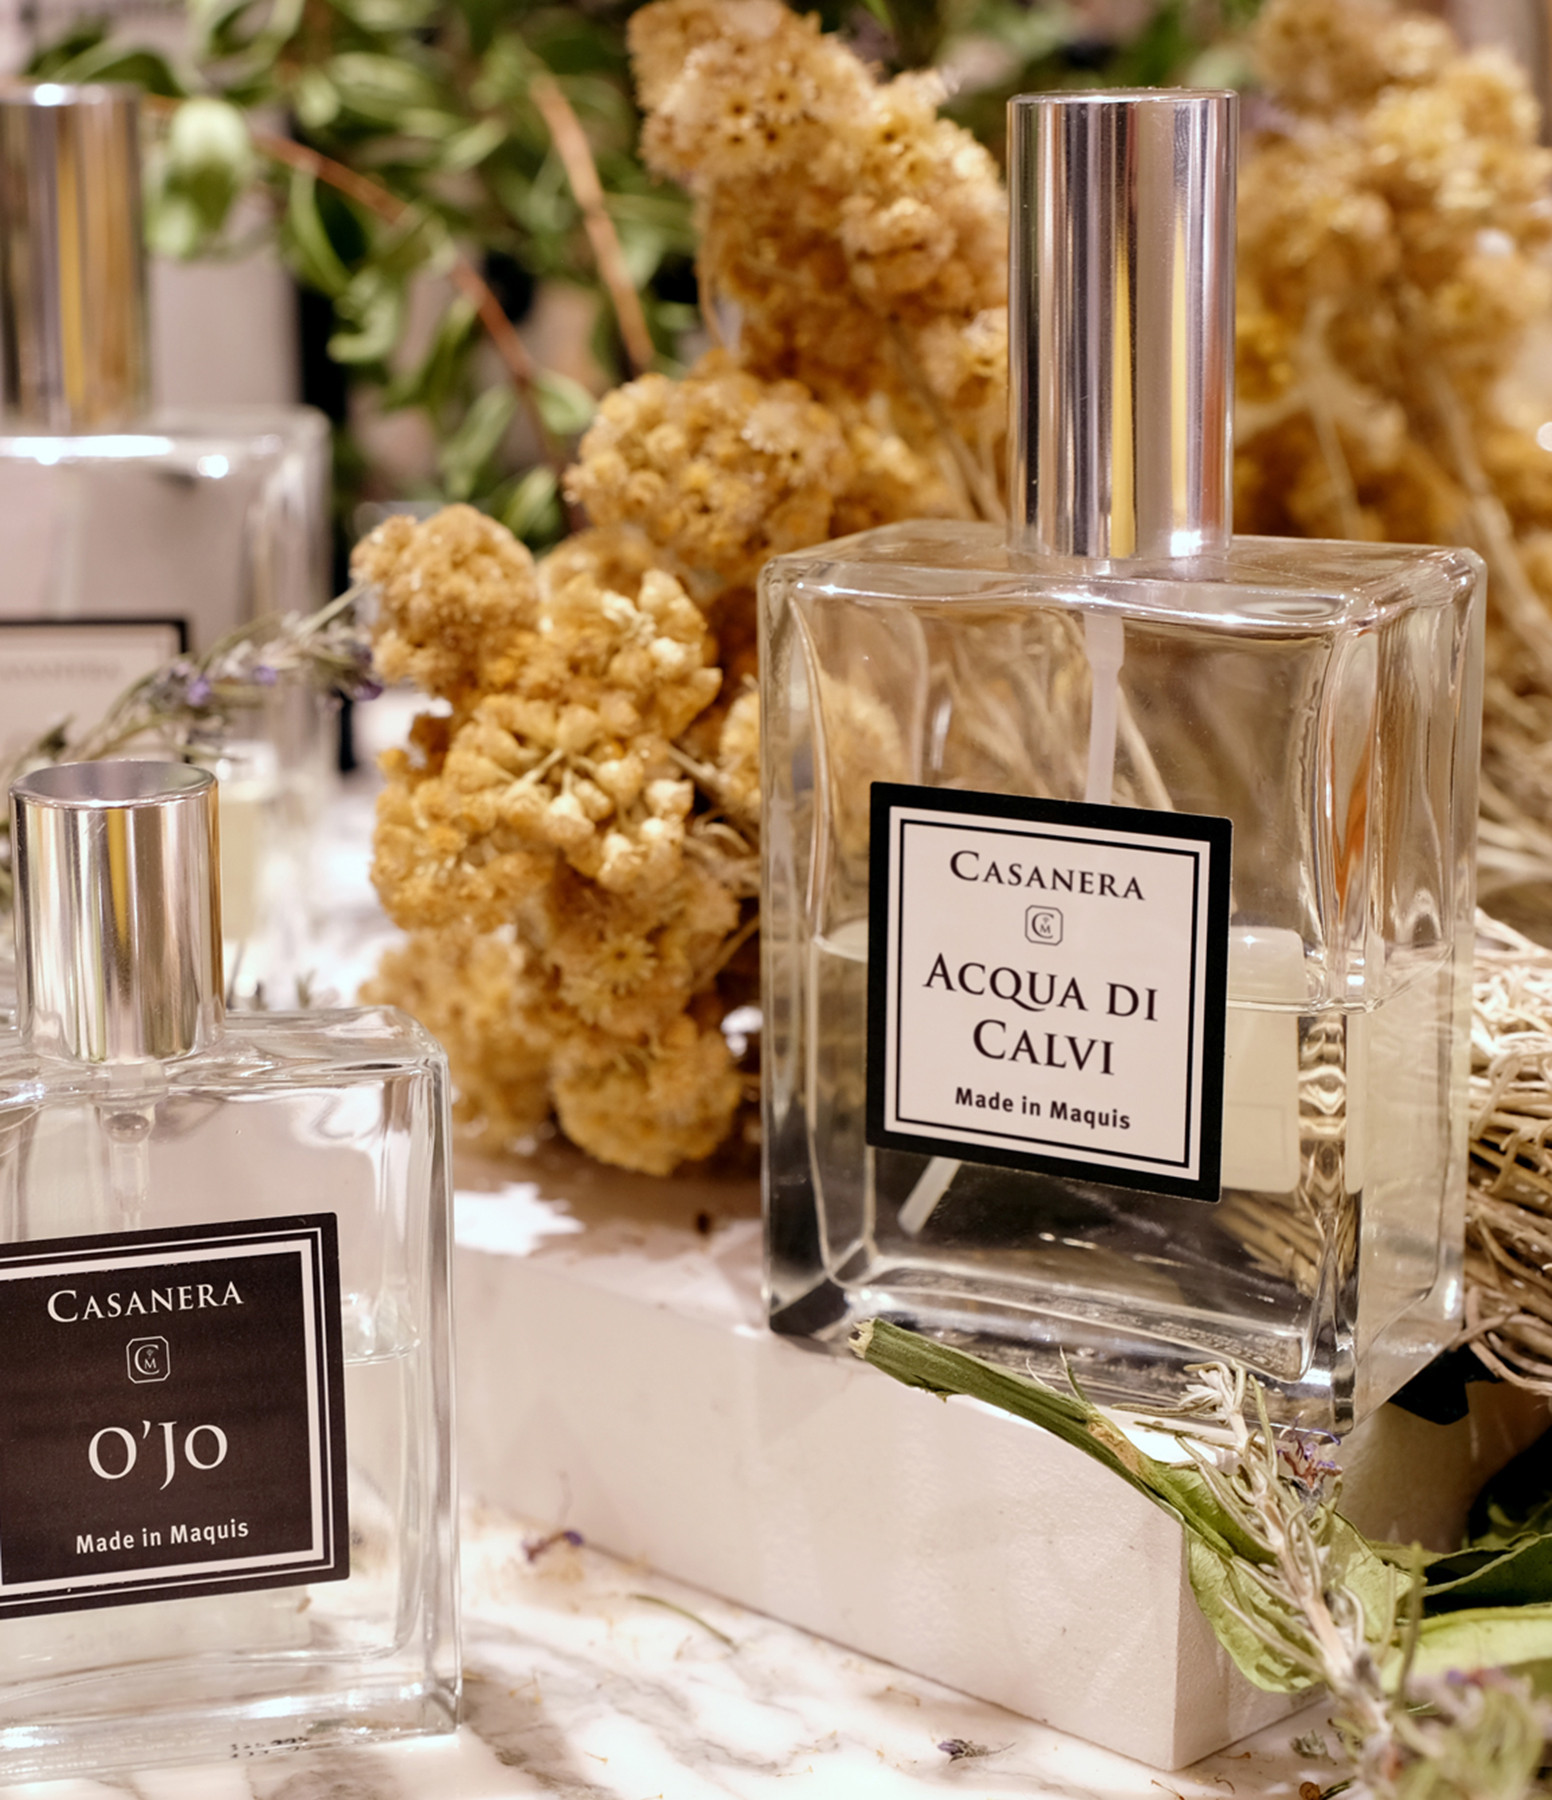 CASANERA - Eau de Parfum Ojo 100ml